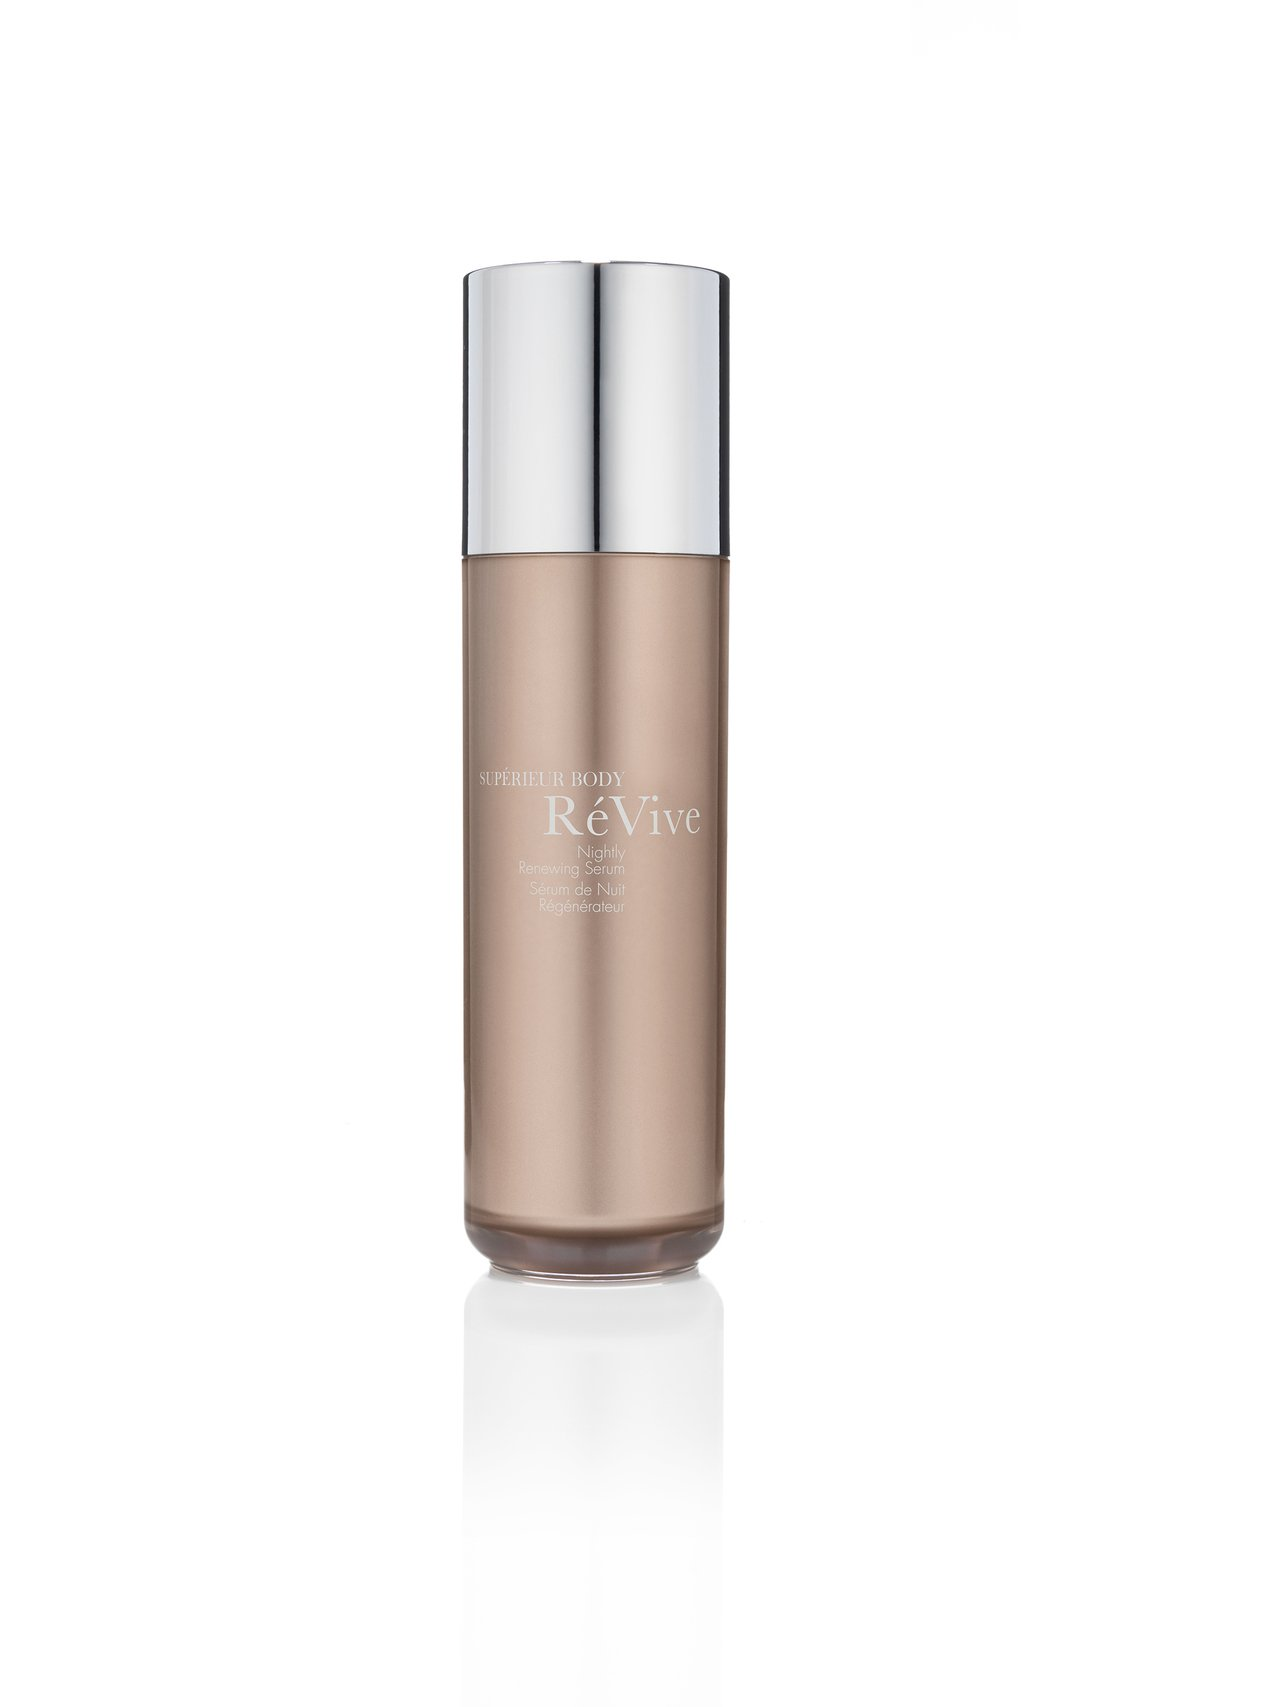 RéVive 4D活膚美體精華/120ml/7,800元。圖/RéVive提供